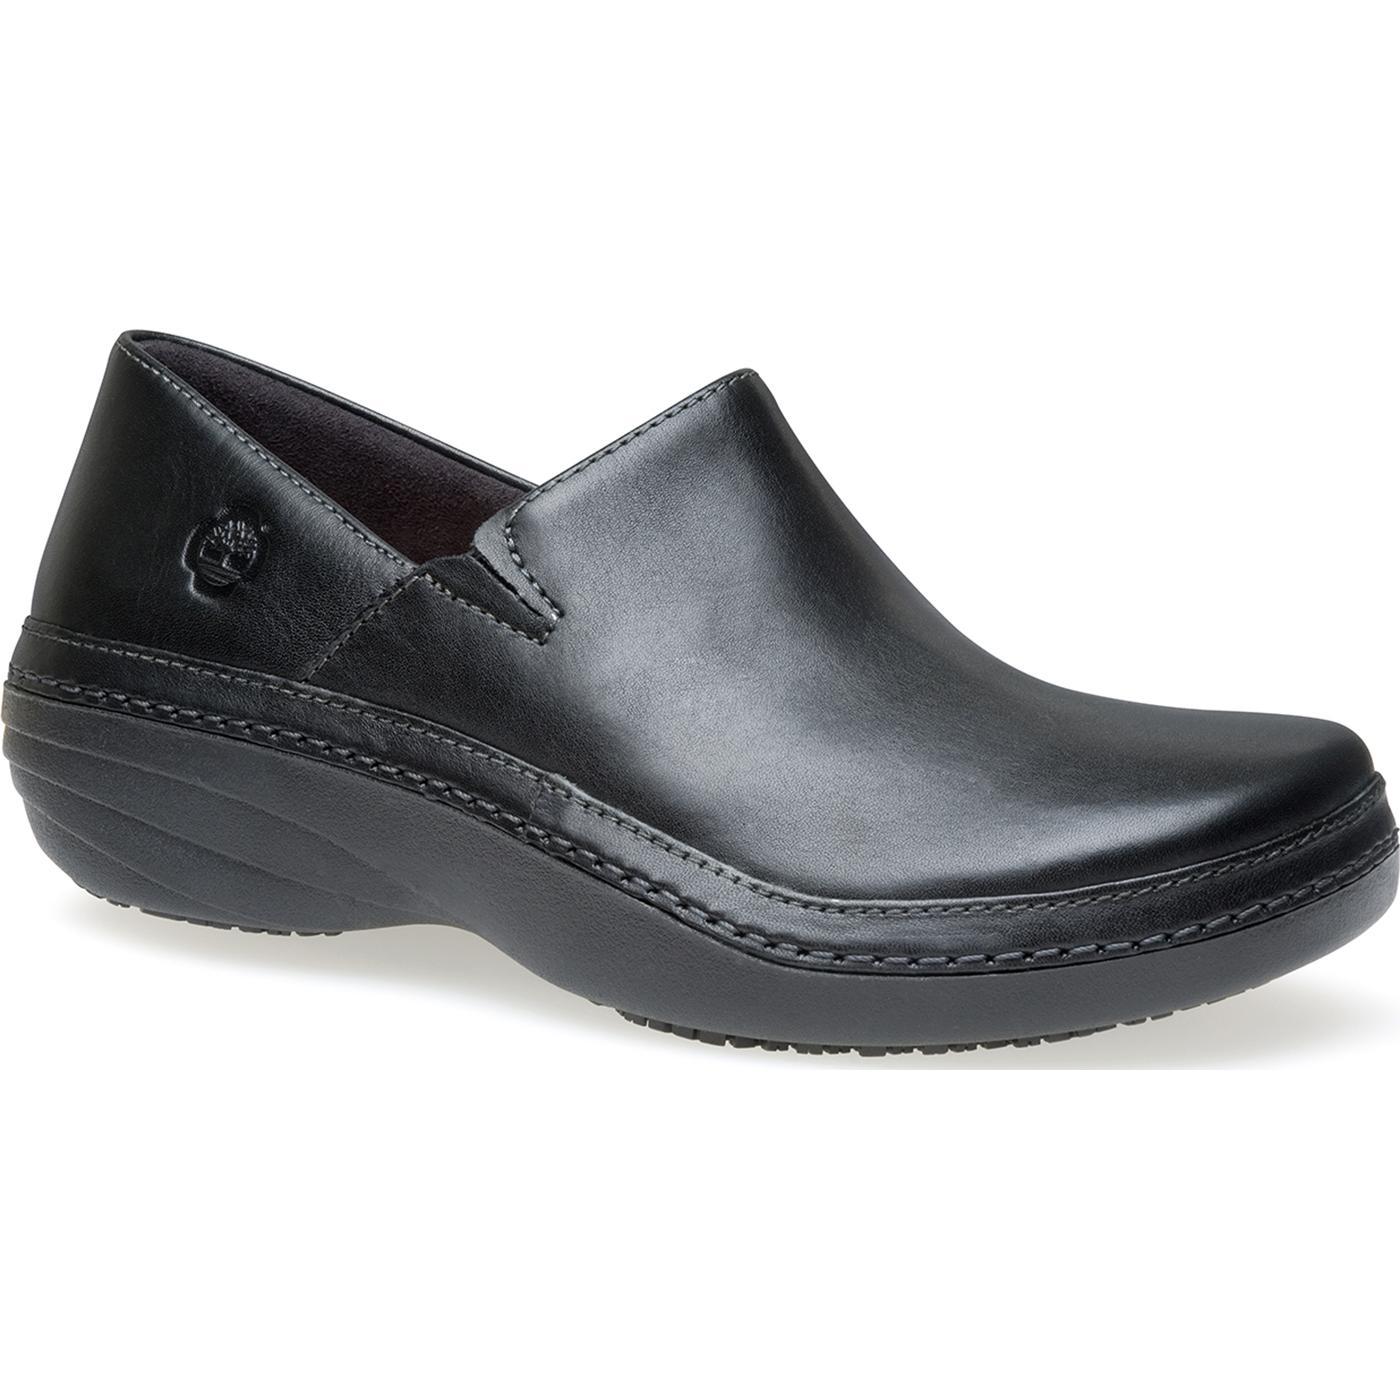 8eb9c4c3a07 Timberland PRO Women's Renova Slip Resistant Slip-On